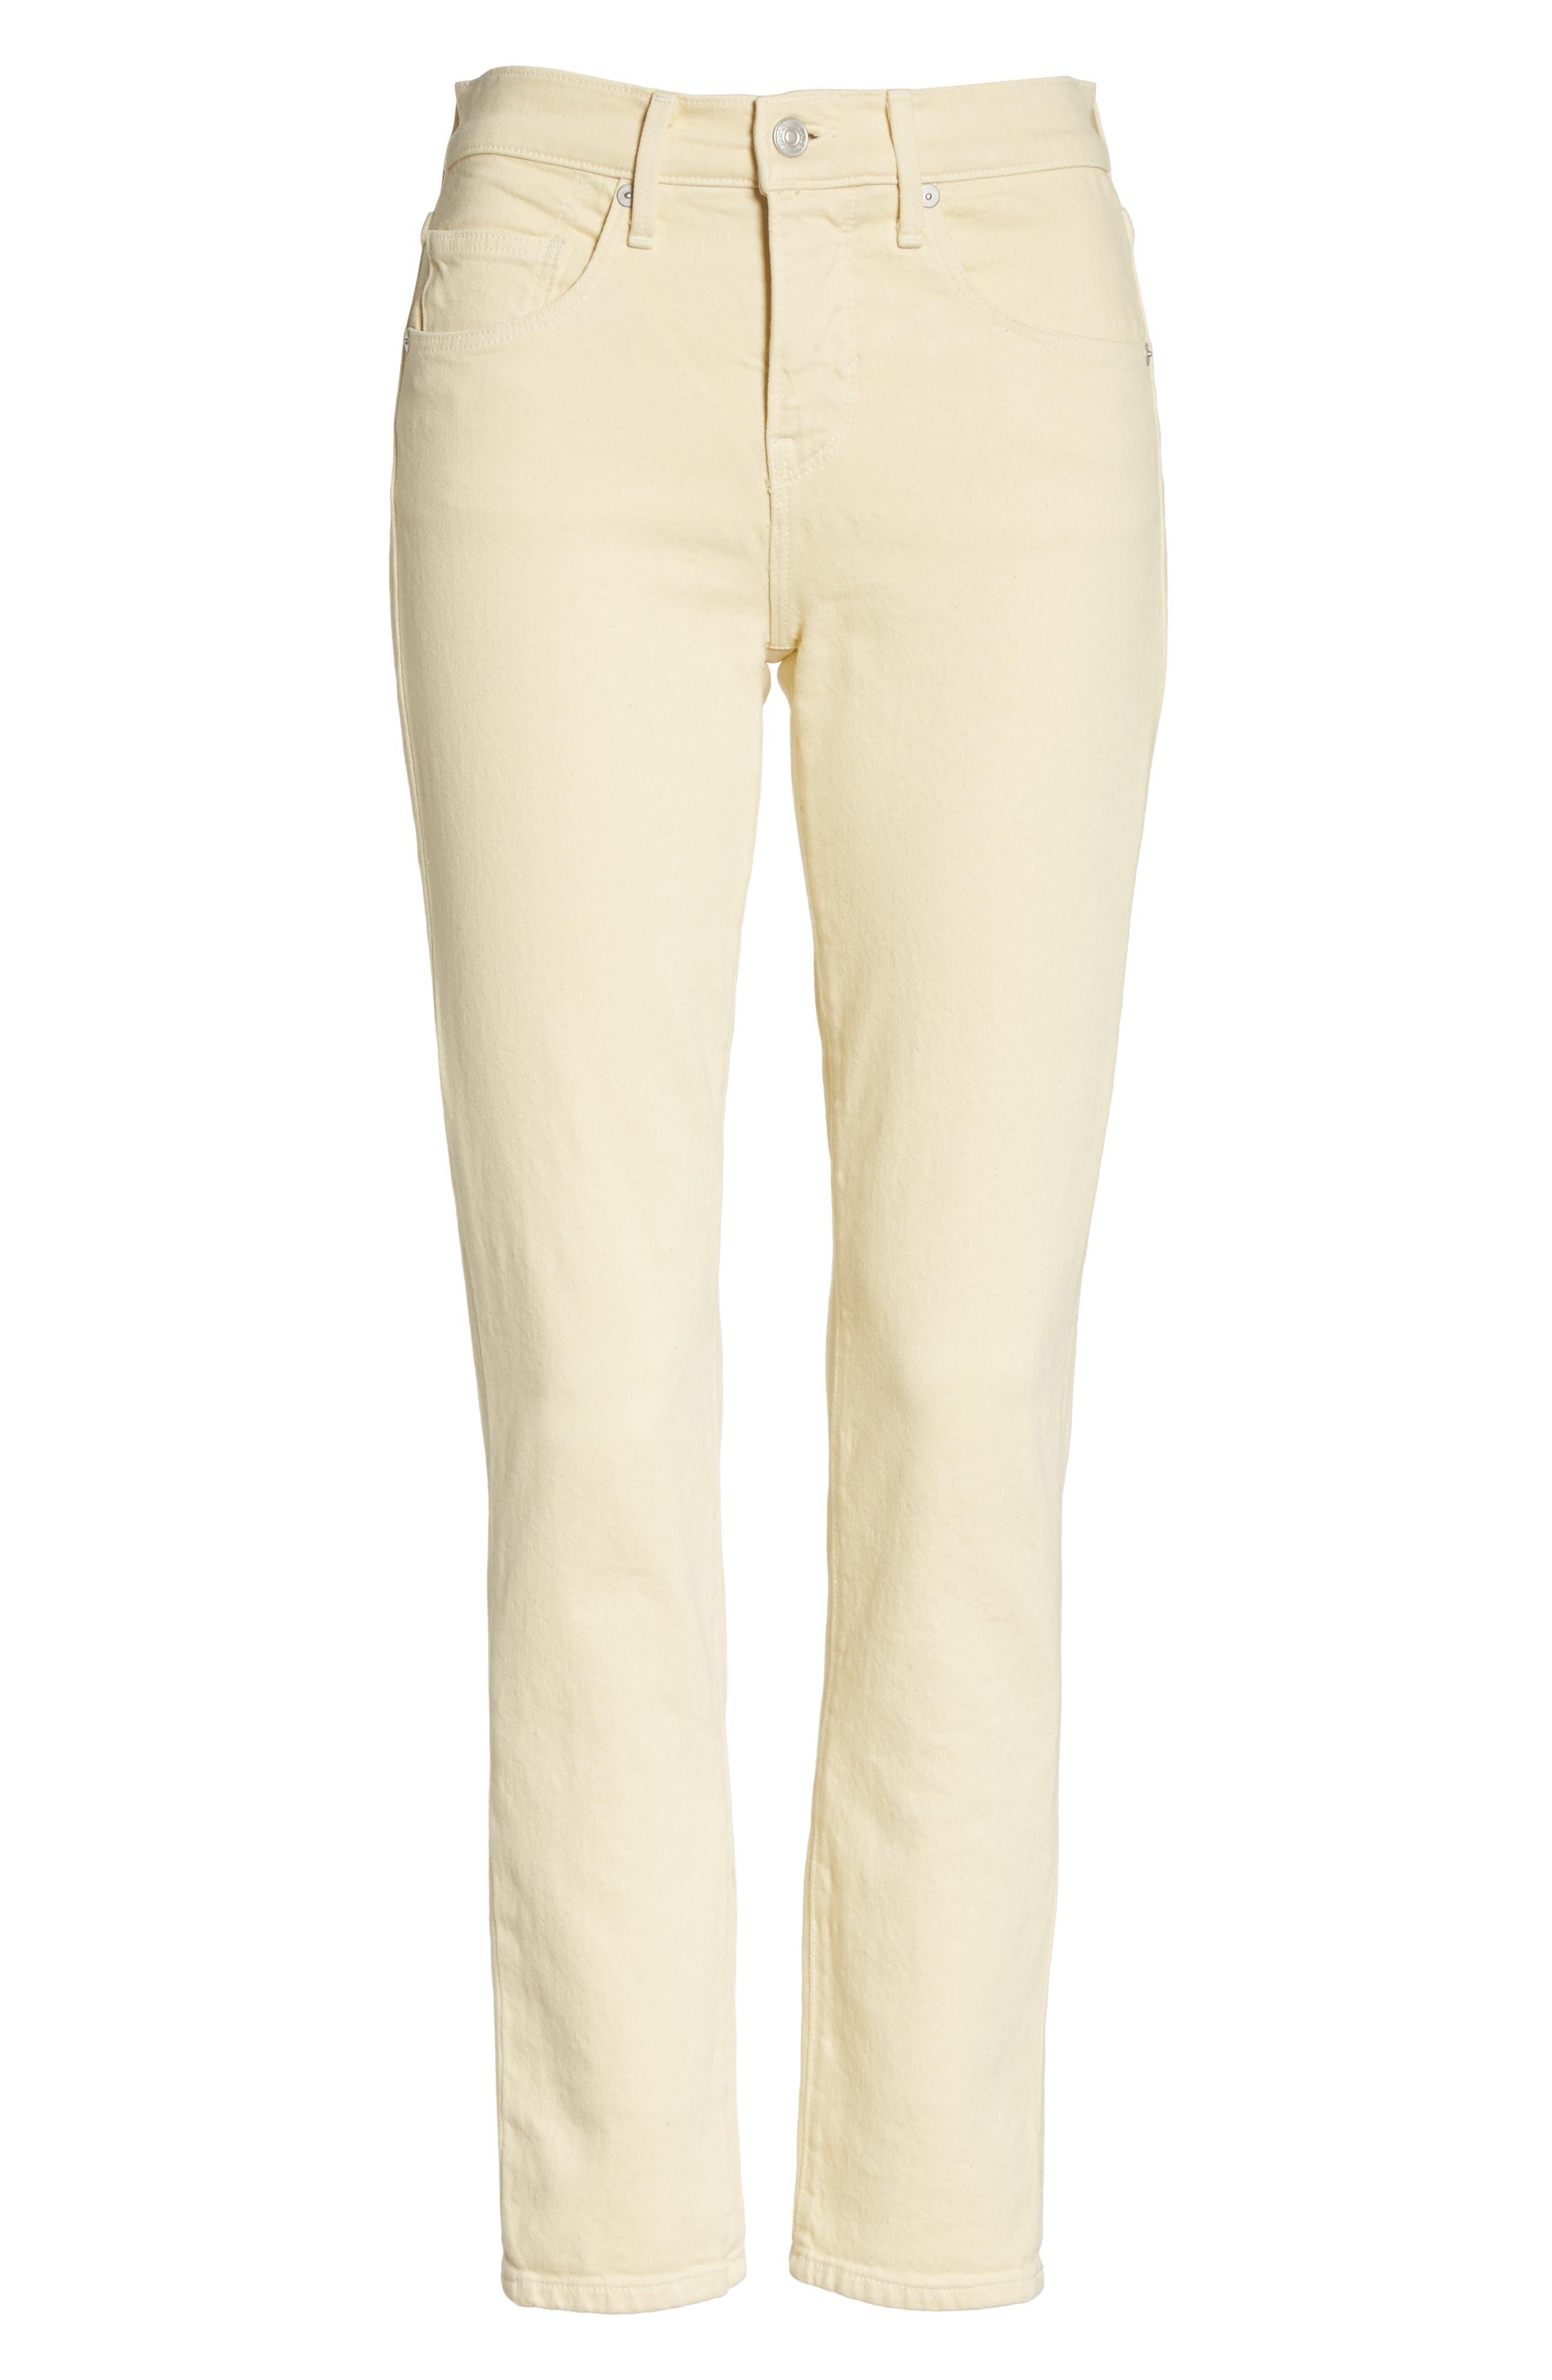 Skinny Crop Jeans,                             Alternate thumbnail 25, color,